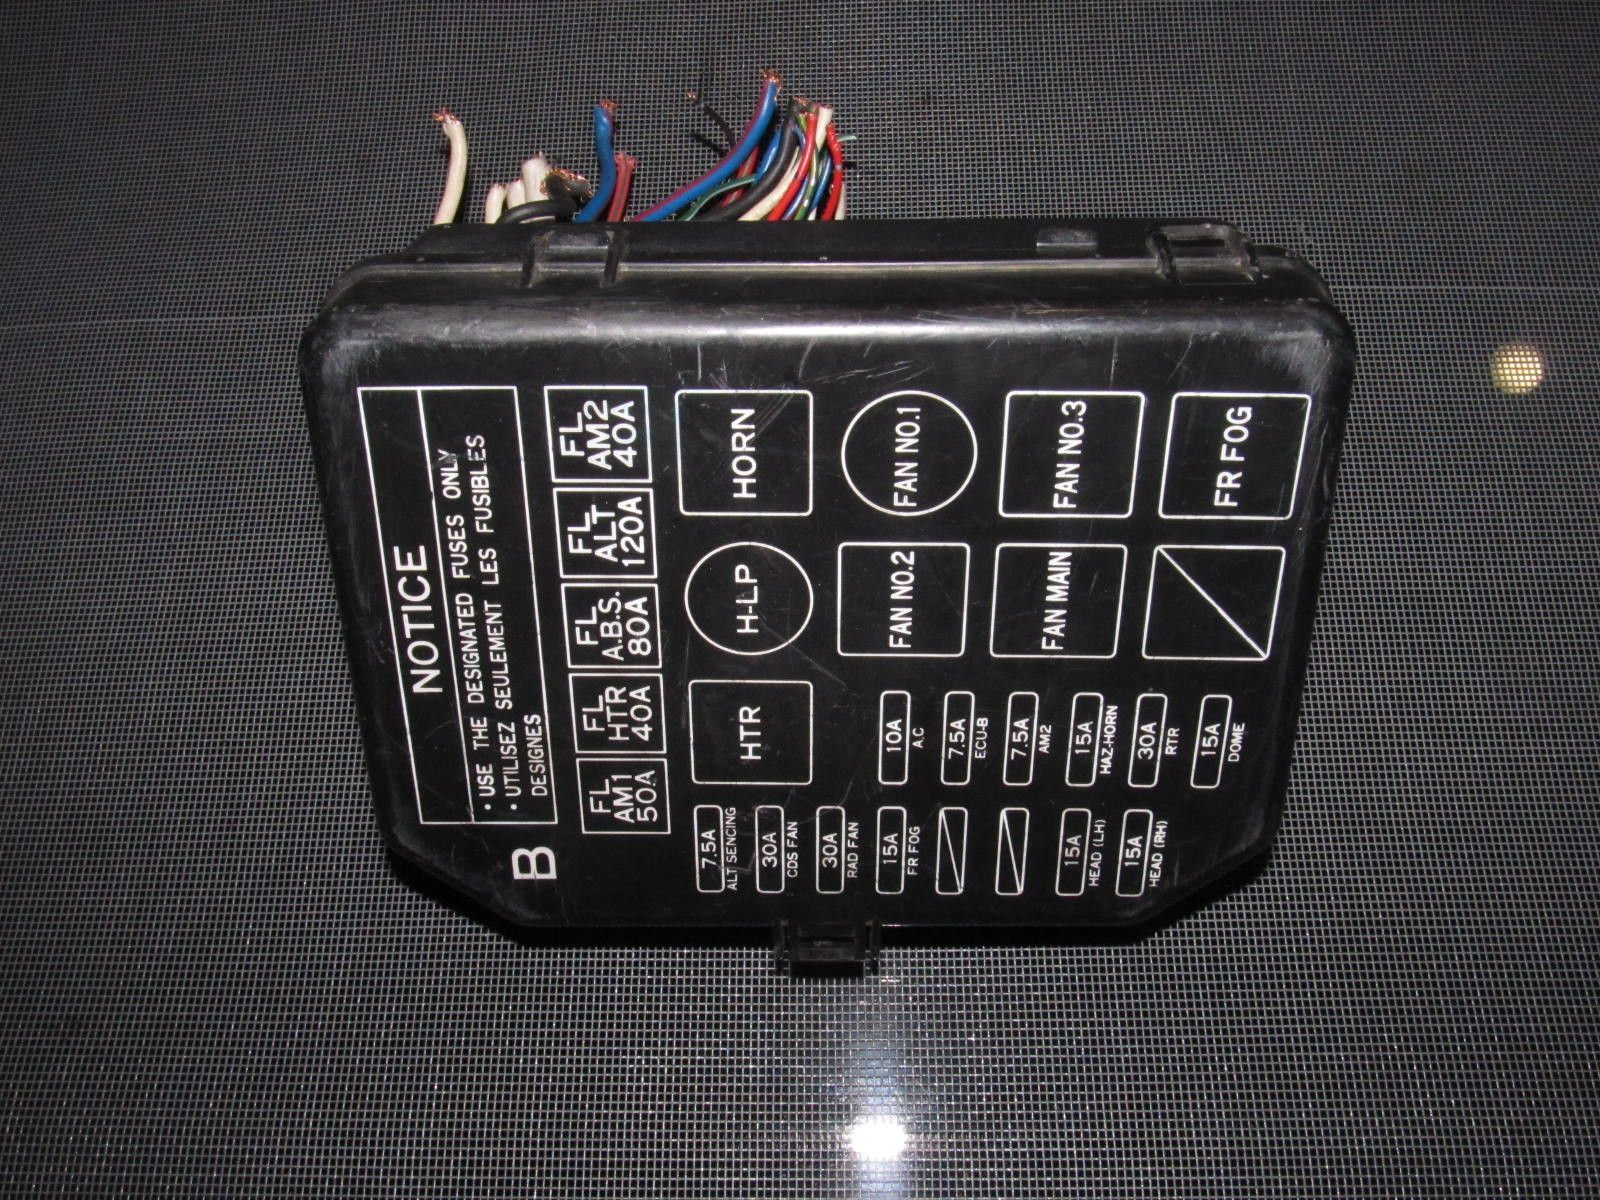 91 95 toyota mr2 oem interior fuse box autopartone com products 2000 f150 fuse box diagram [ 1600 x 1200 Pixel ]